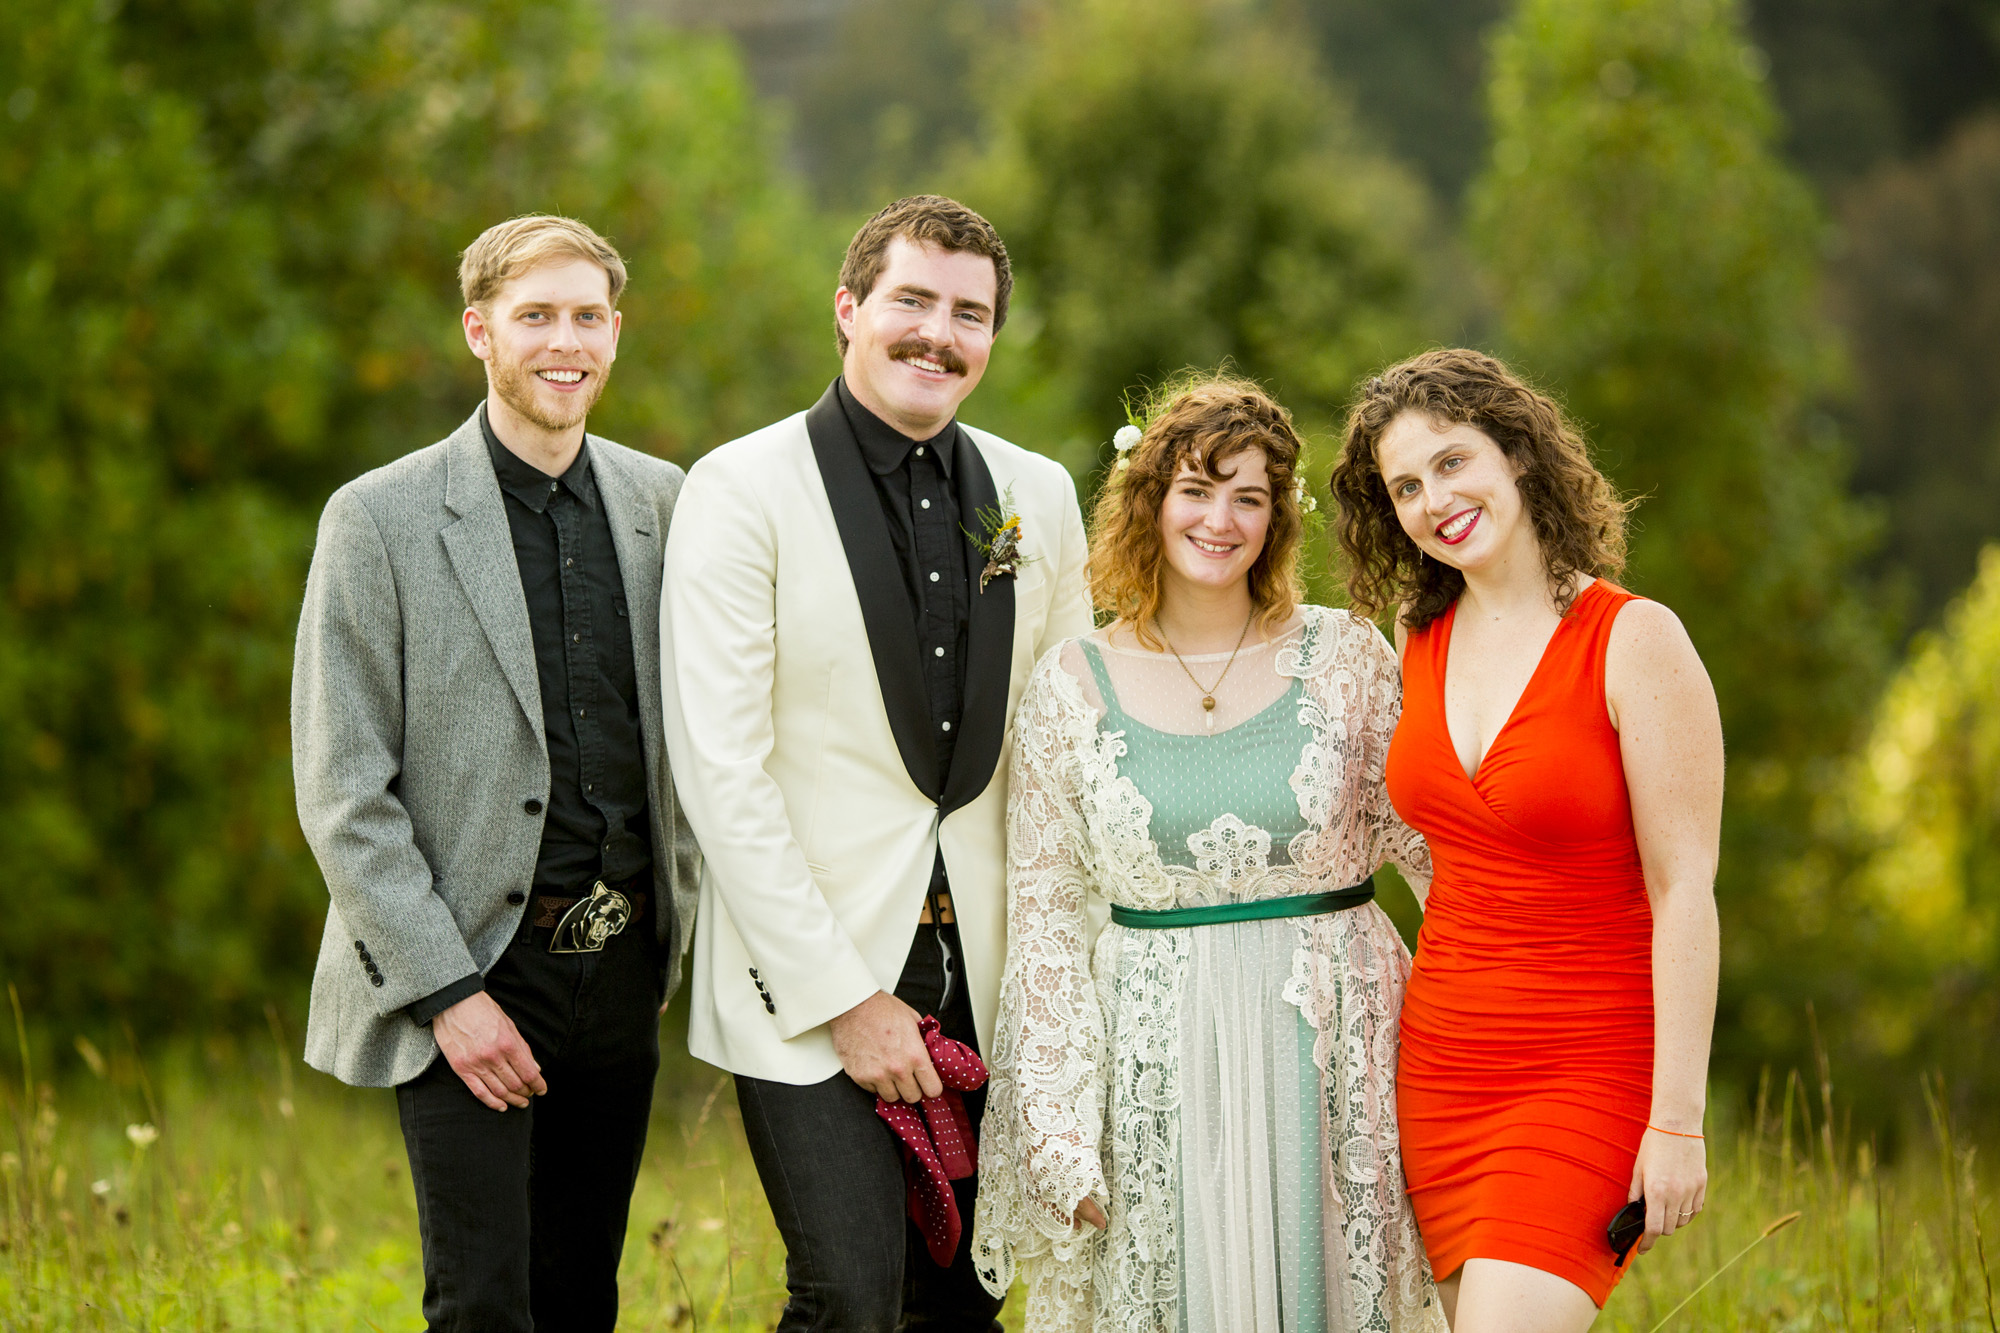 Seriously_Sabrina_Photography_Red_River_Gorge_Kentucky_Wedding_ShawnDana146.jpg